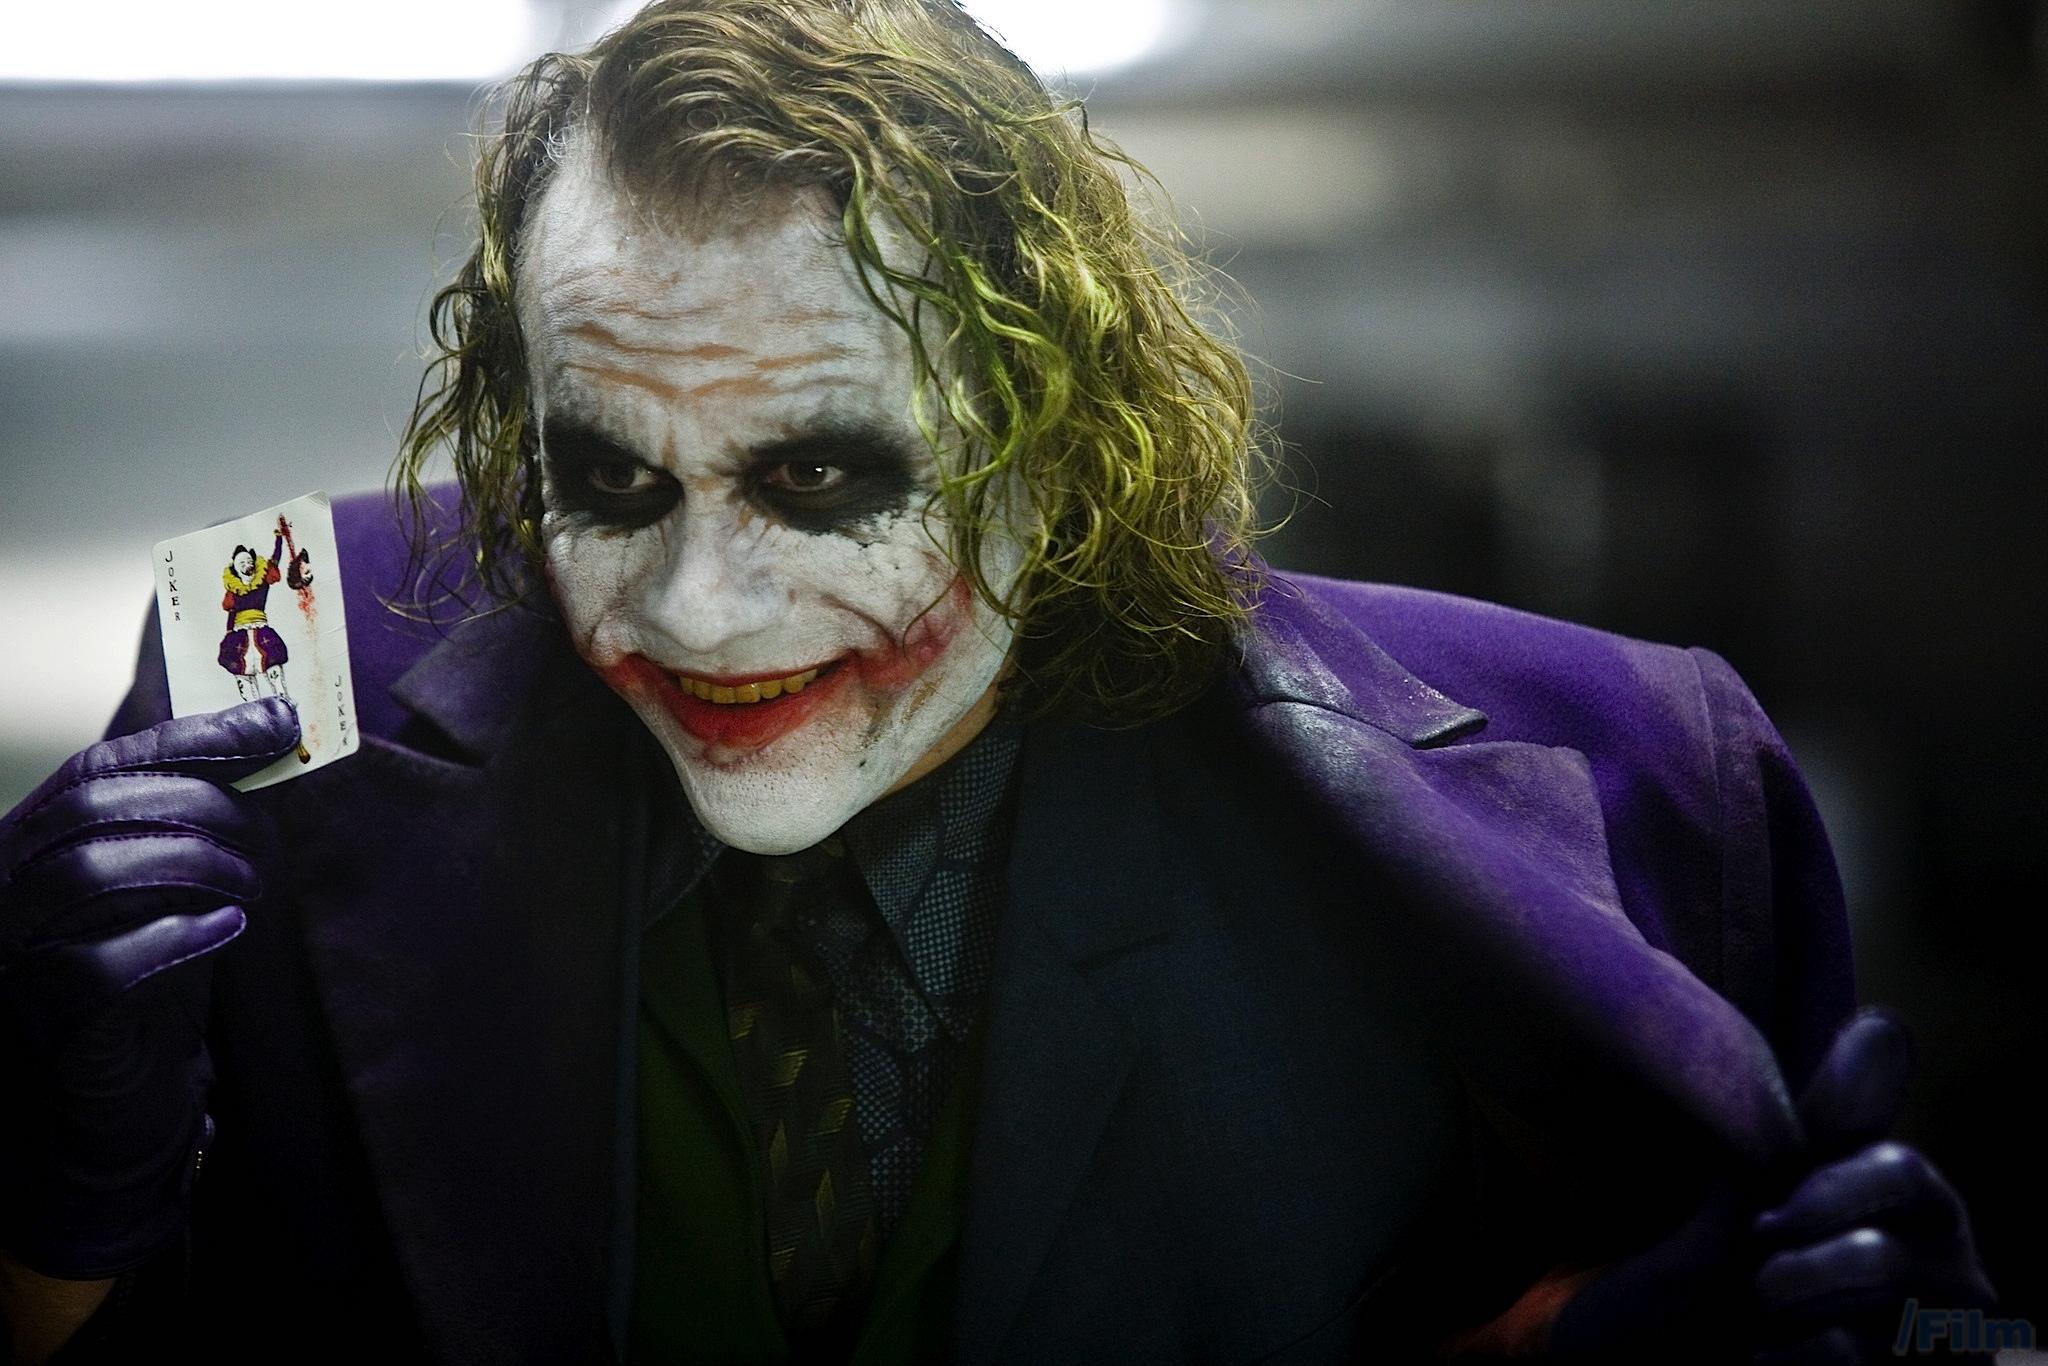 Heath-Ledger-è-il-Joker